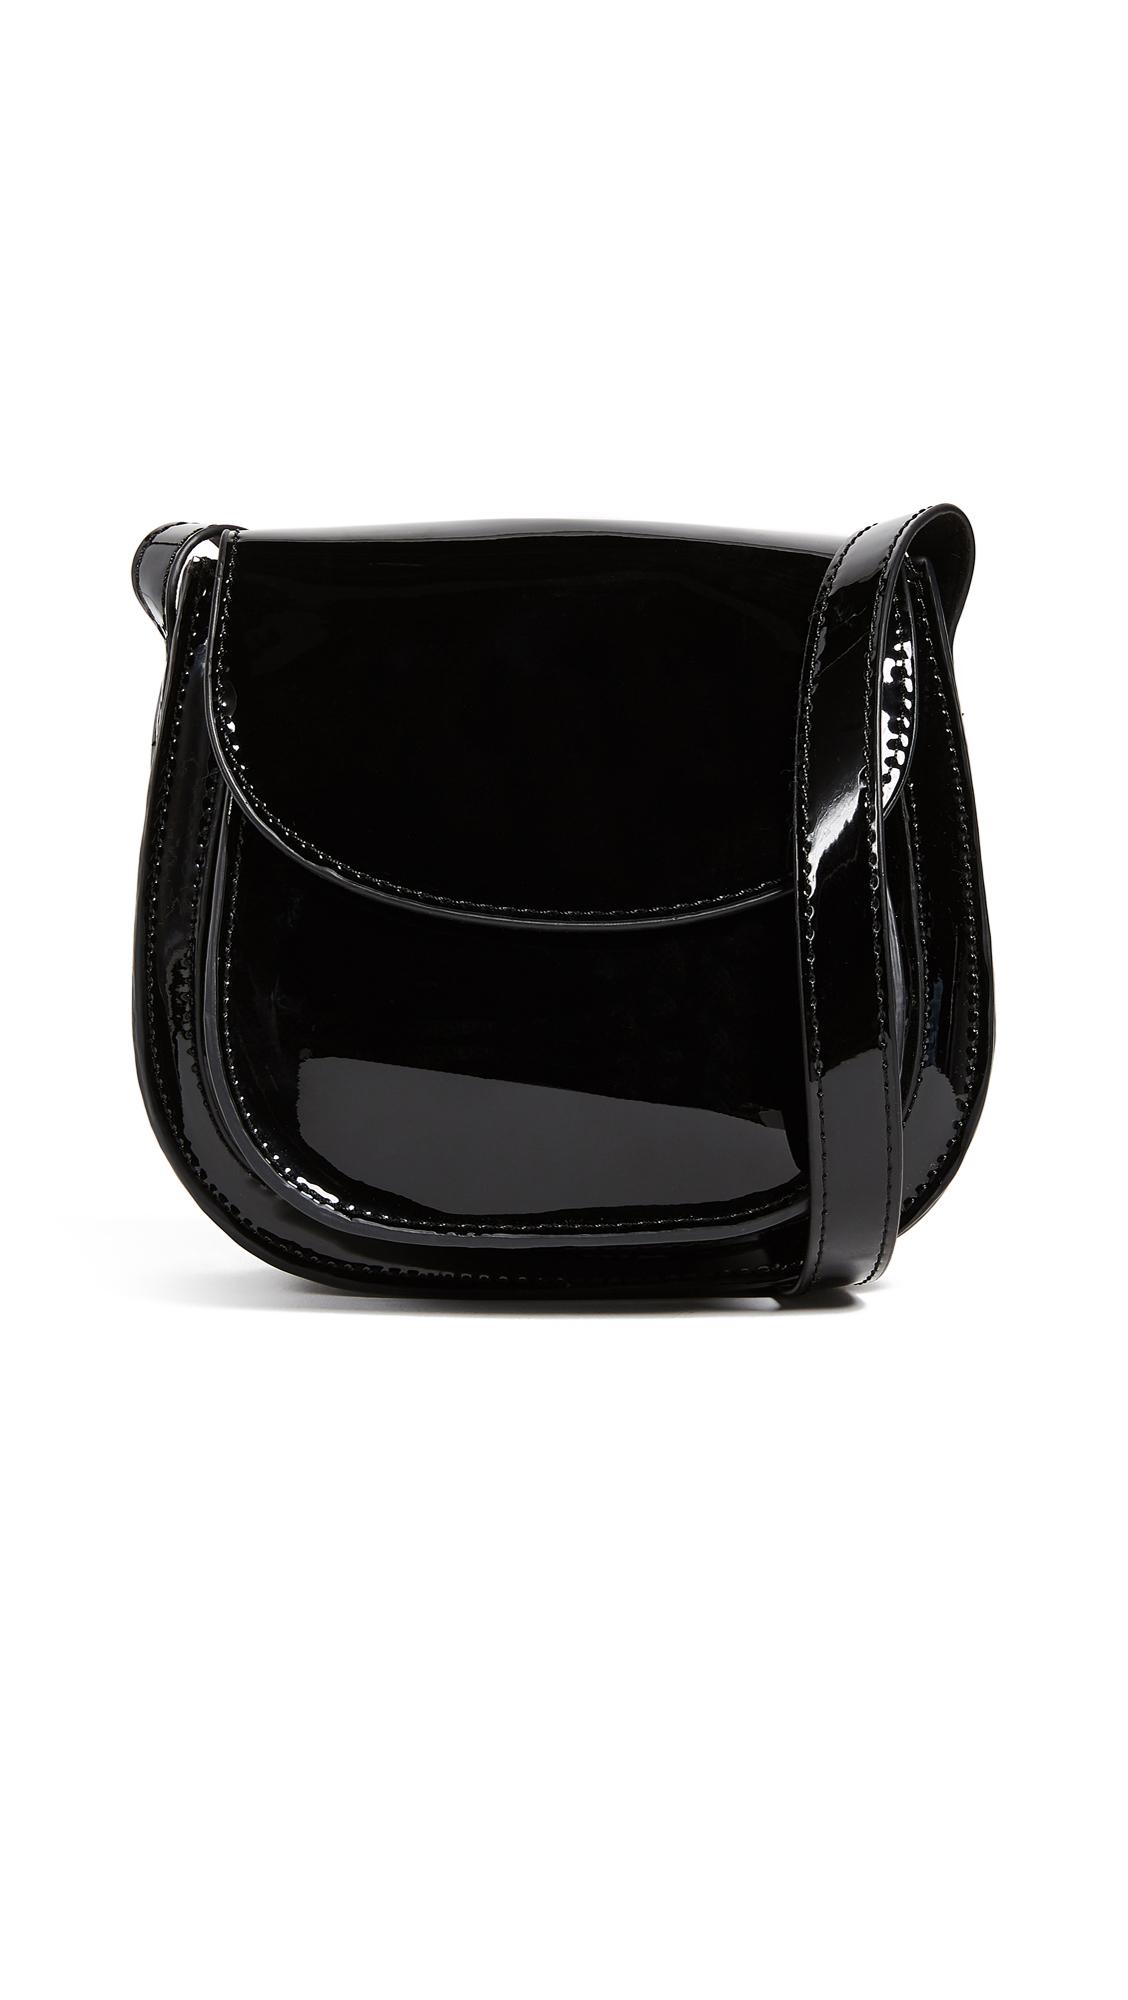 Deux Lux Skyline Cross Body Bag - Black